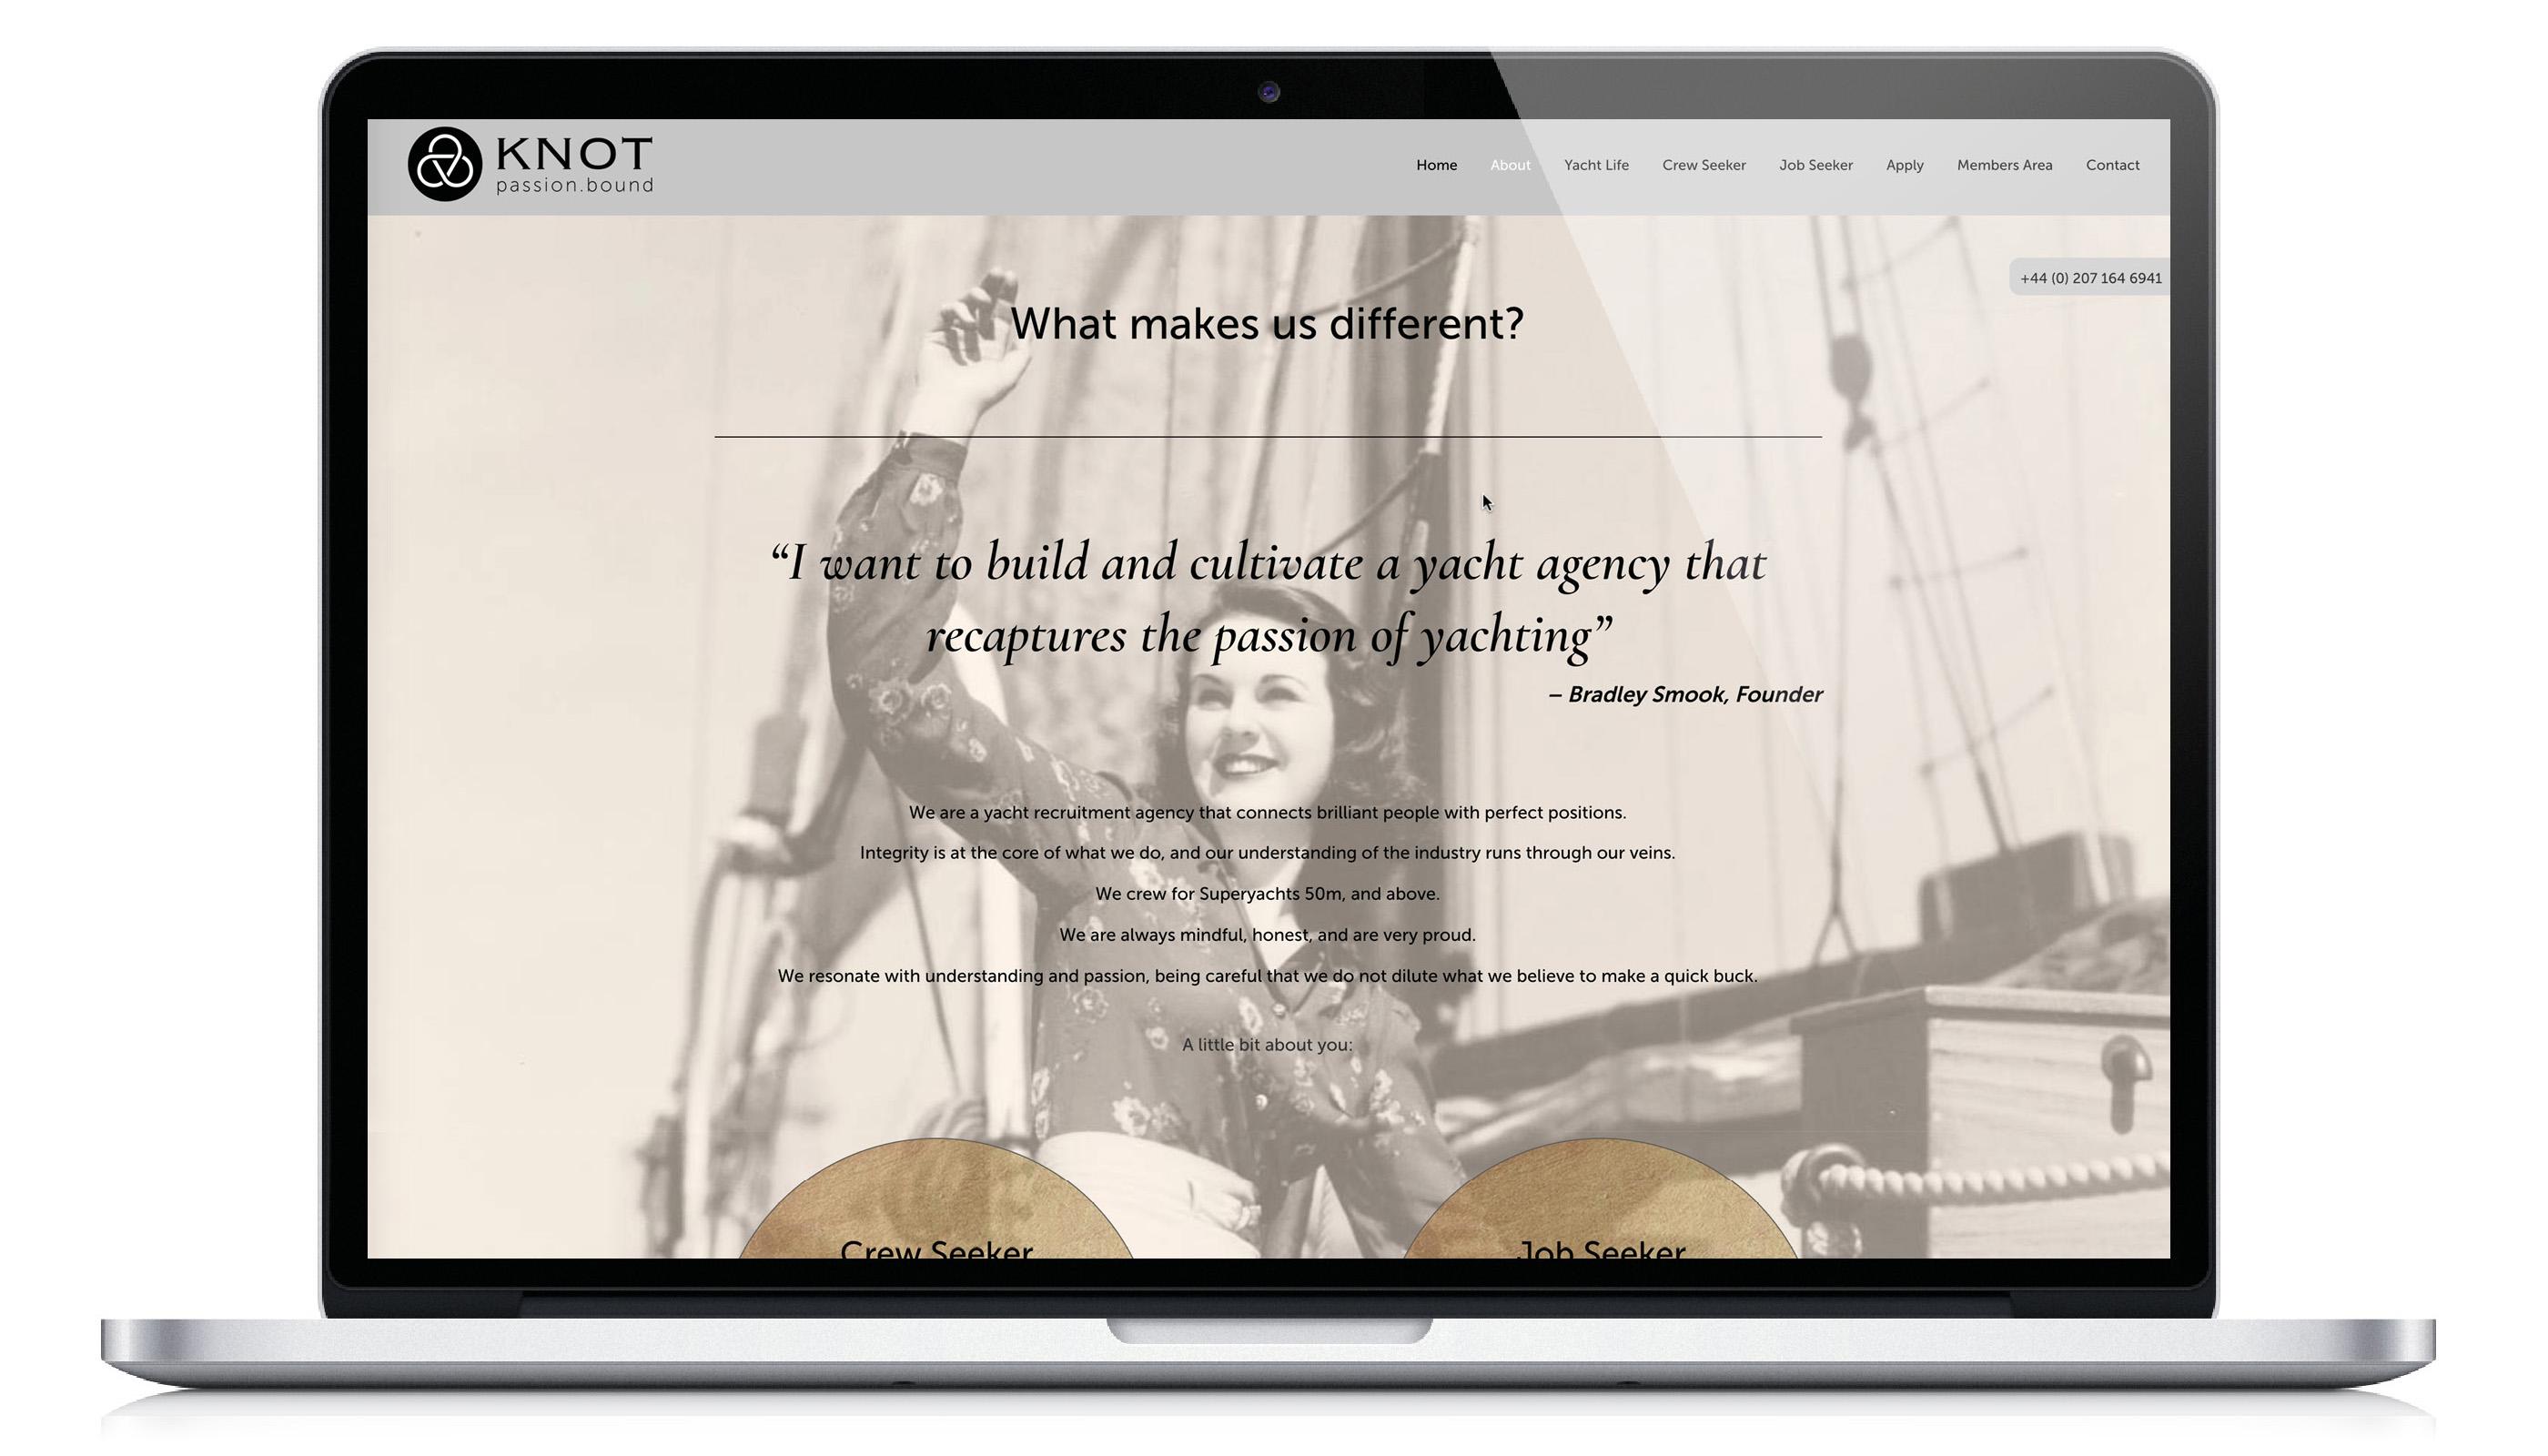 knot_webdesign_02